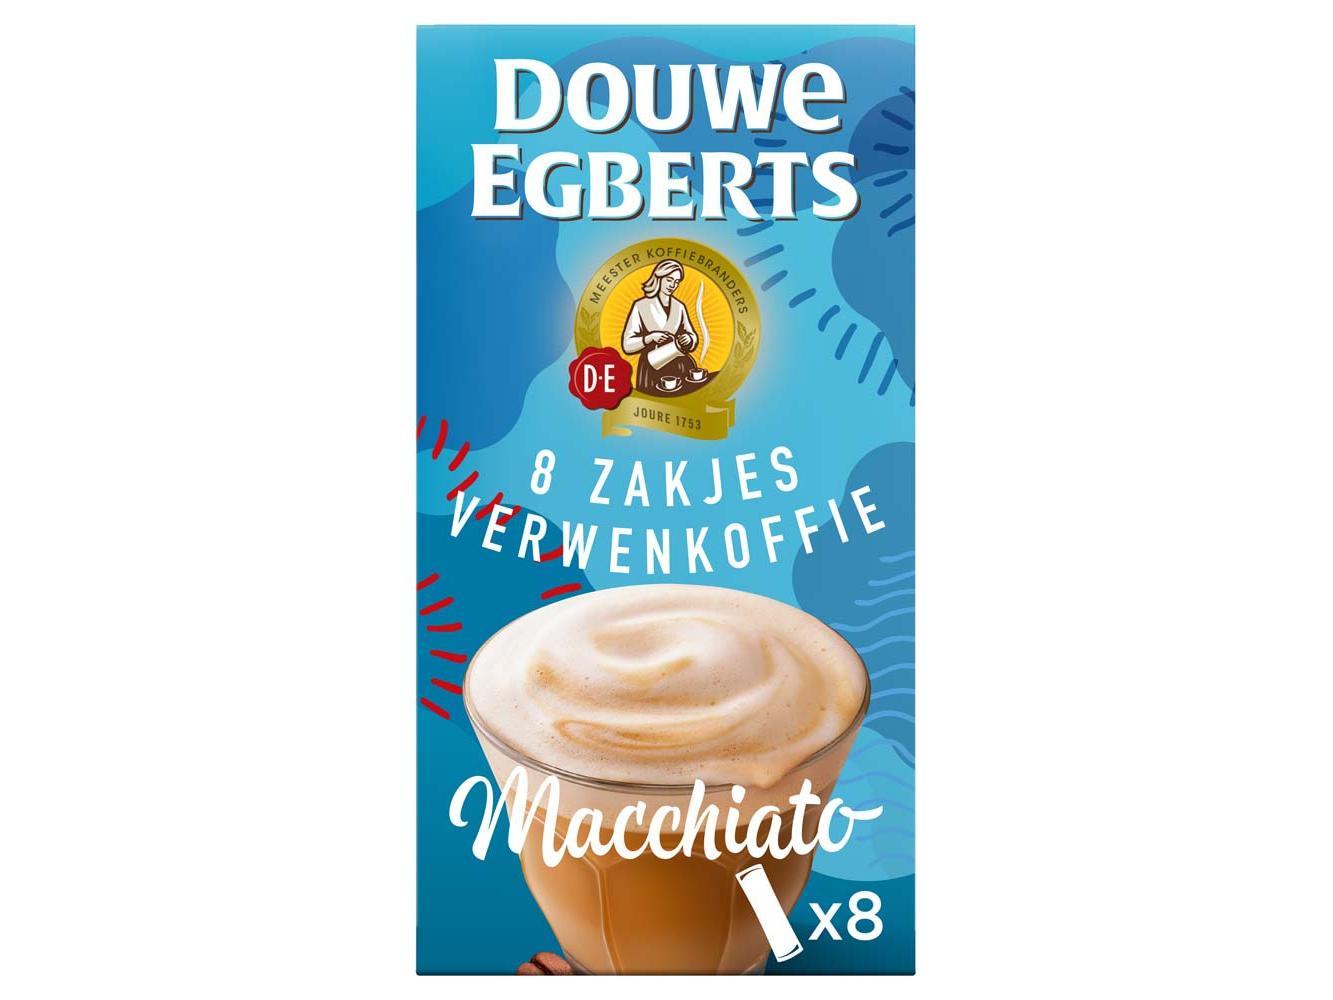 Douwe Egberts Latte Macchiato